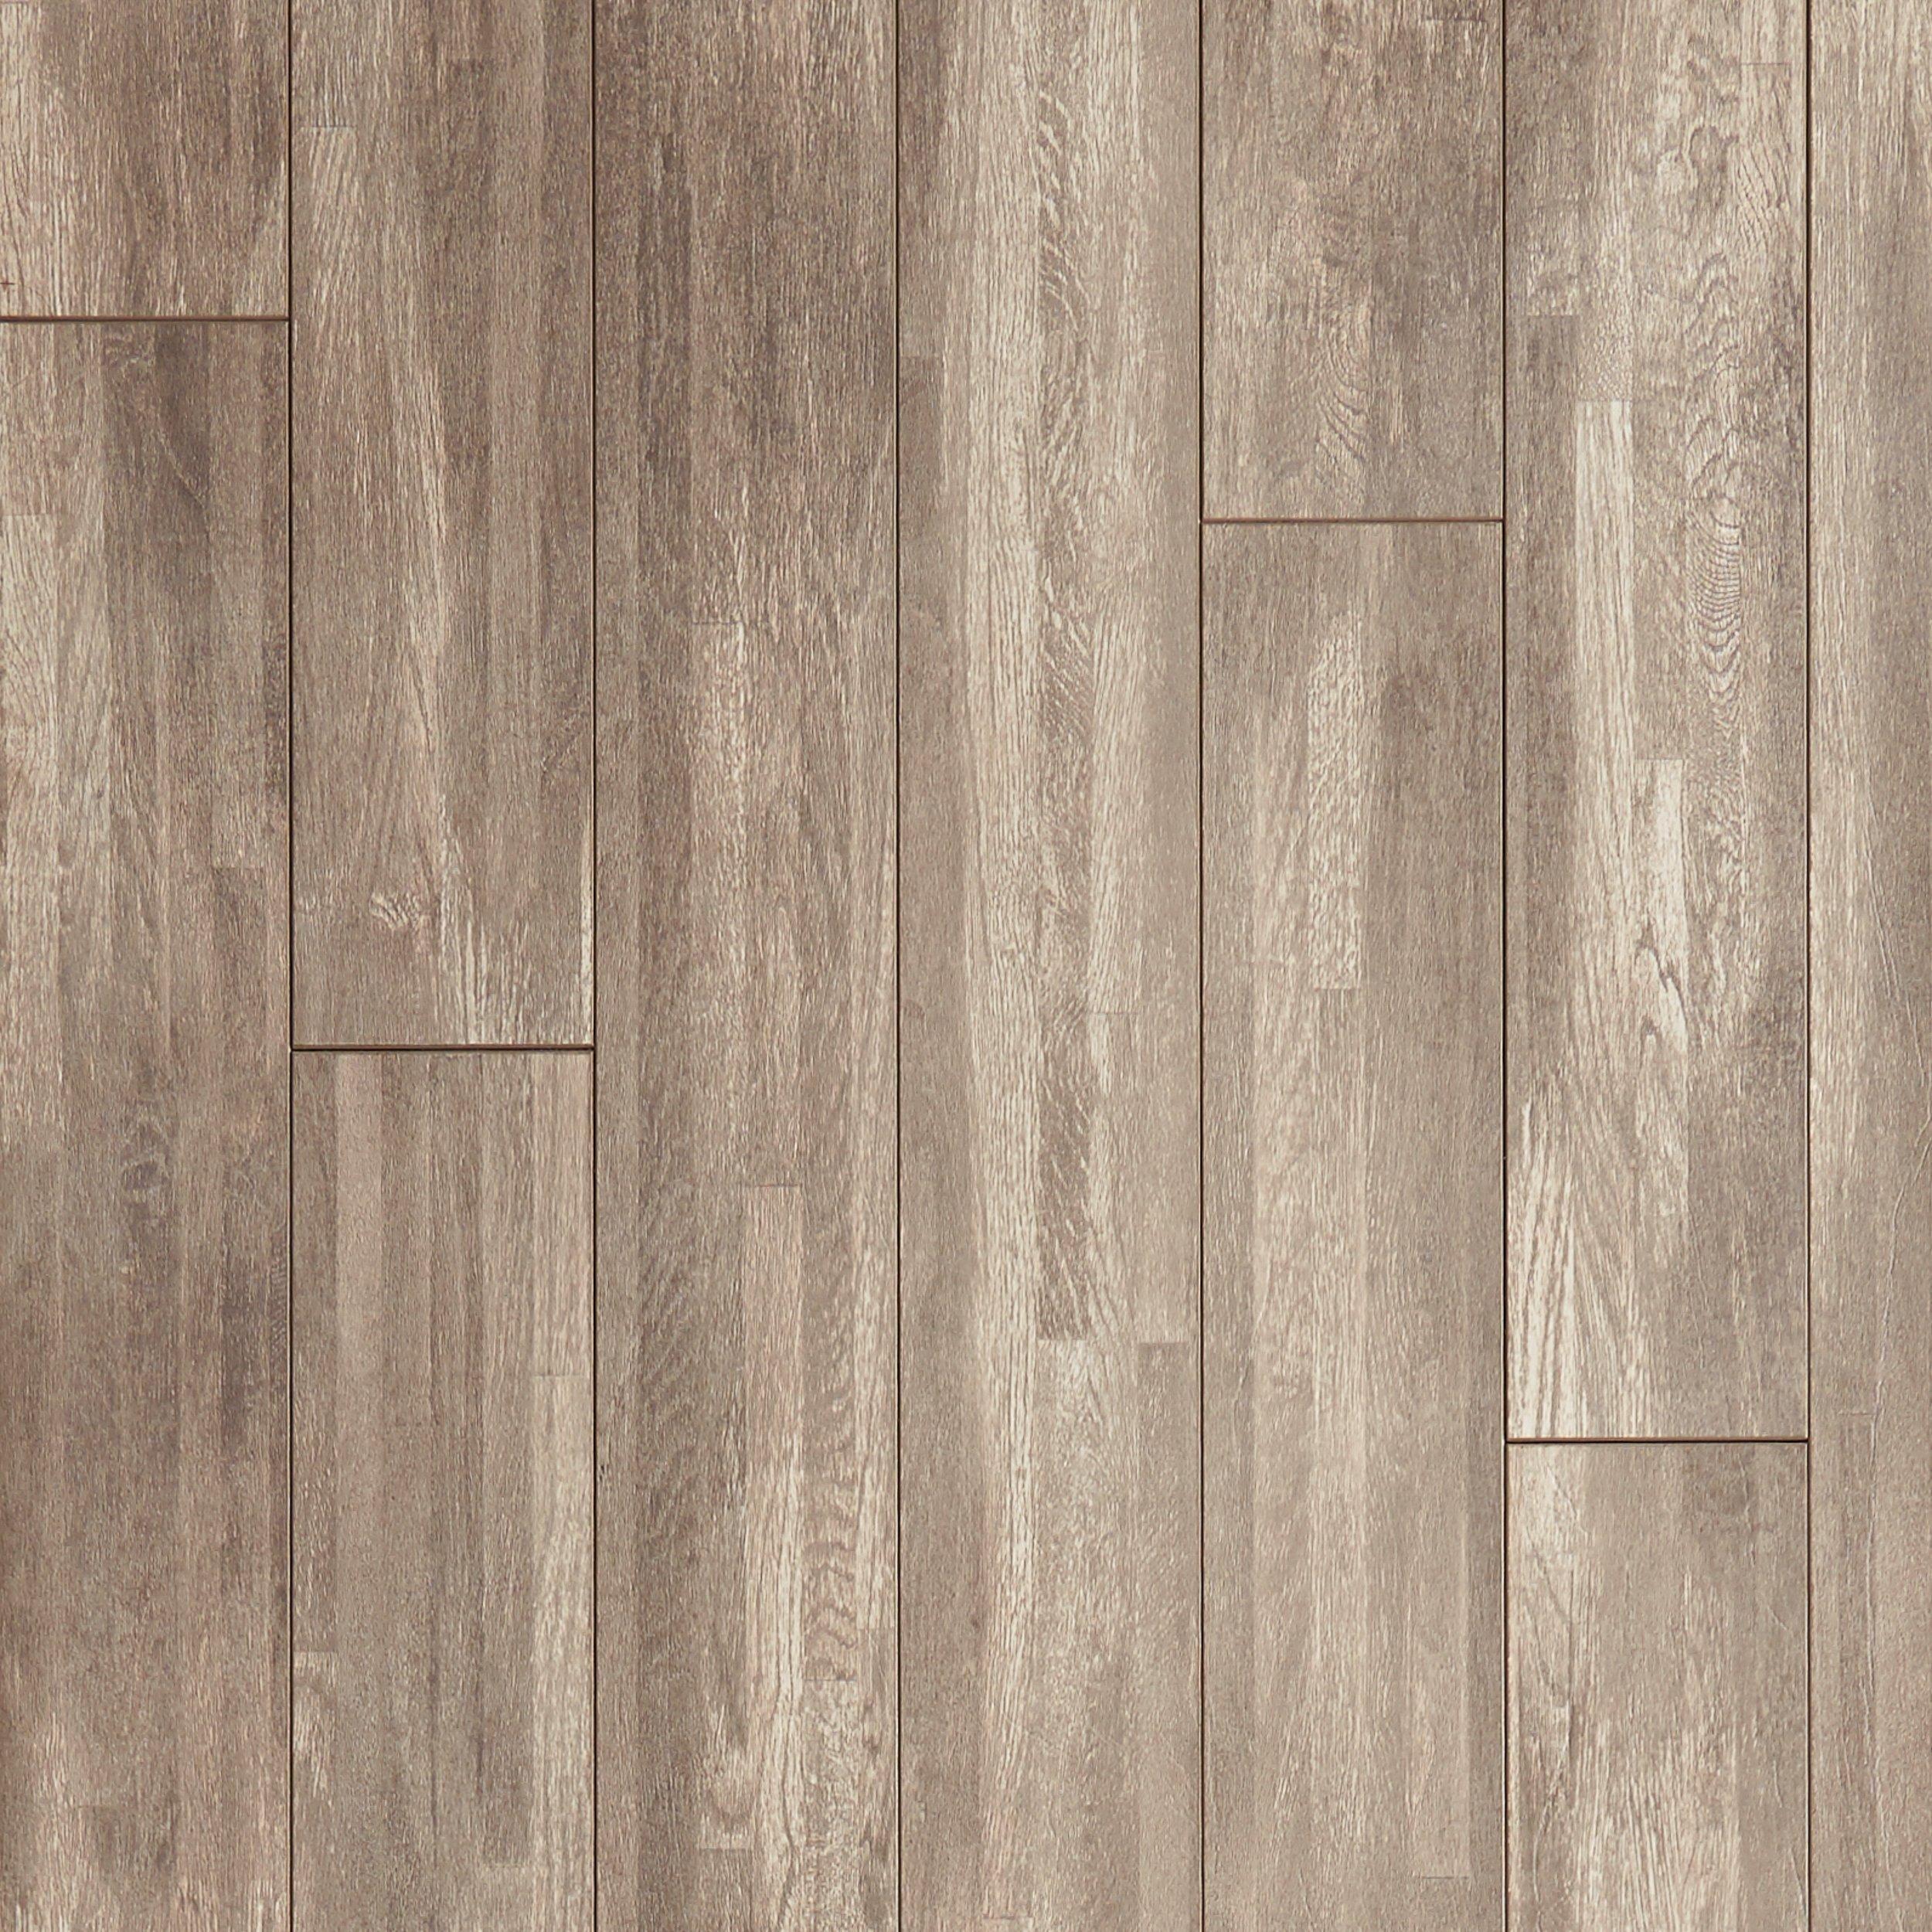 Types Of Kitchen Flooring Ideas: Mystic Oak Water-Resistant Laminate